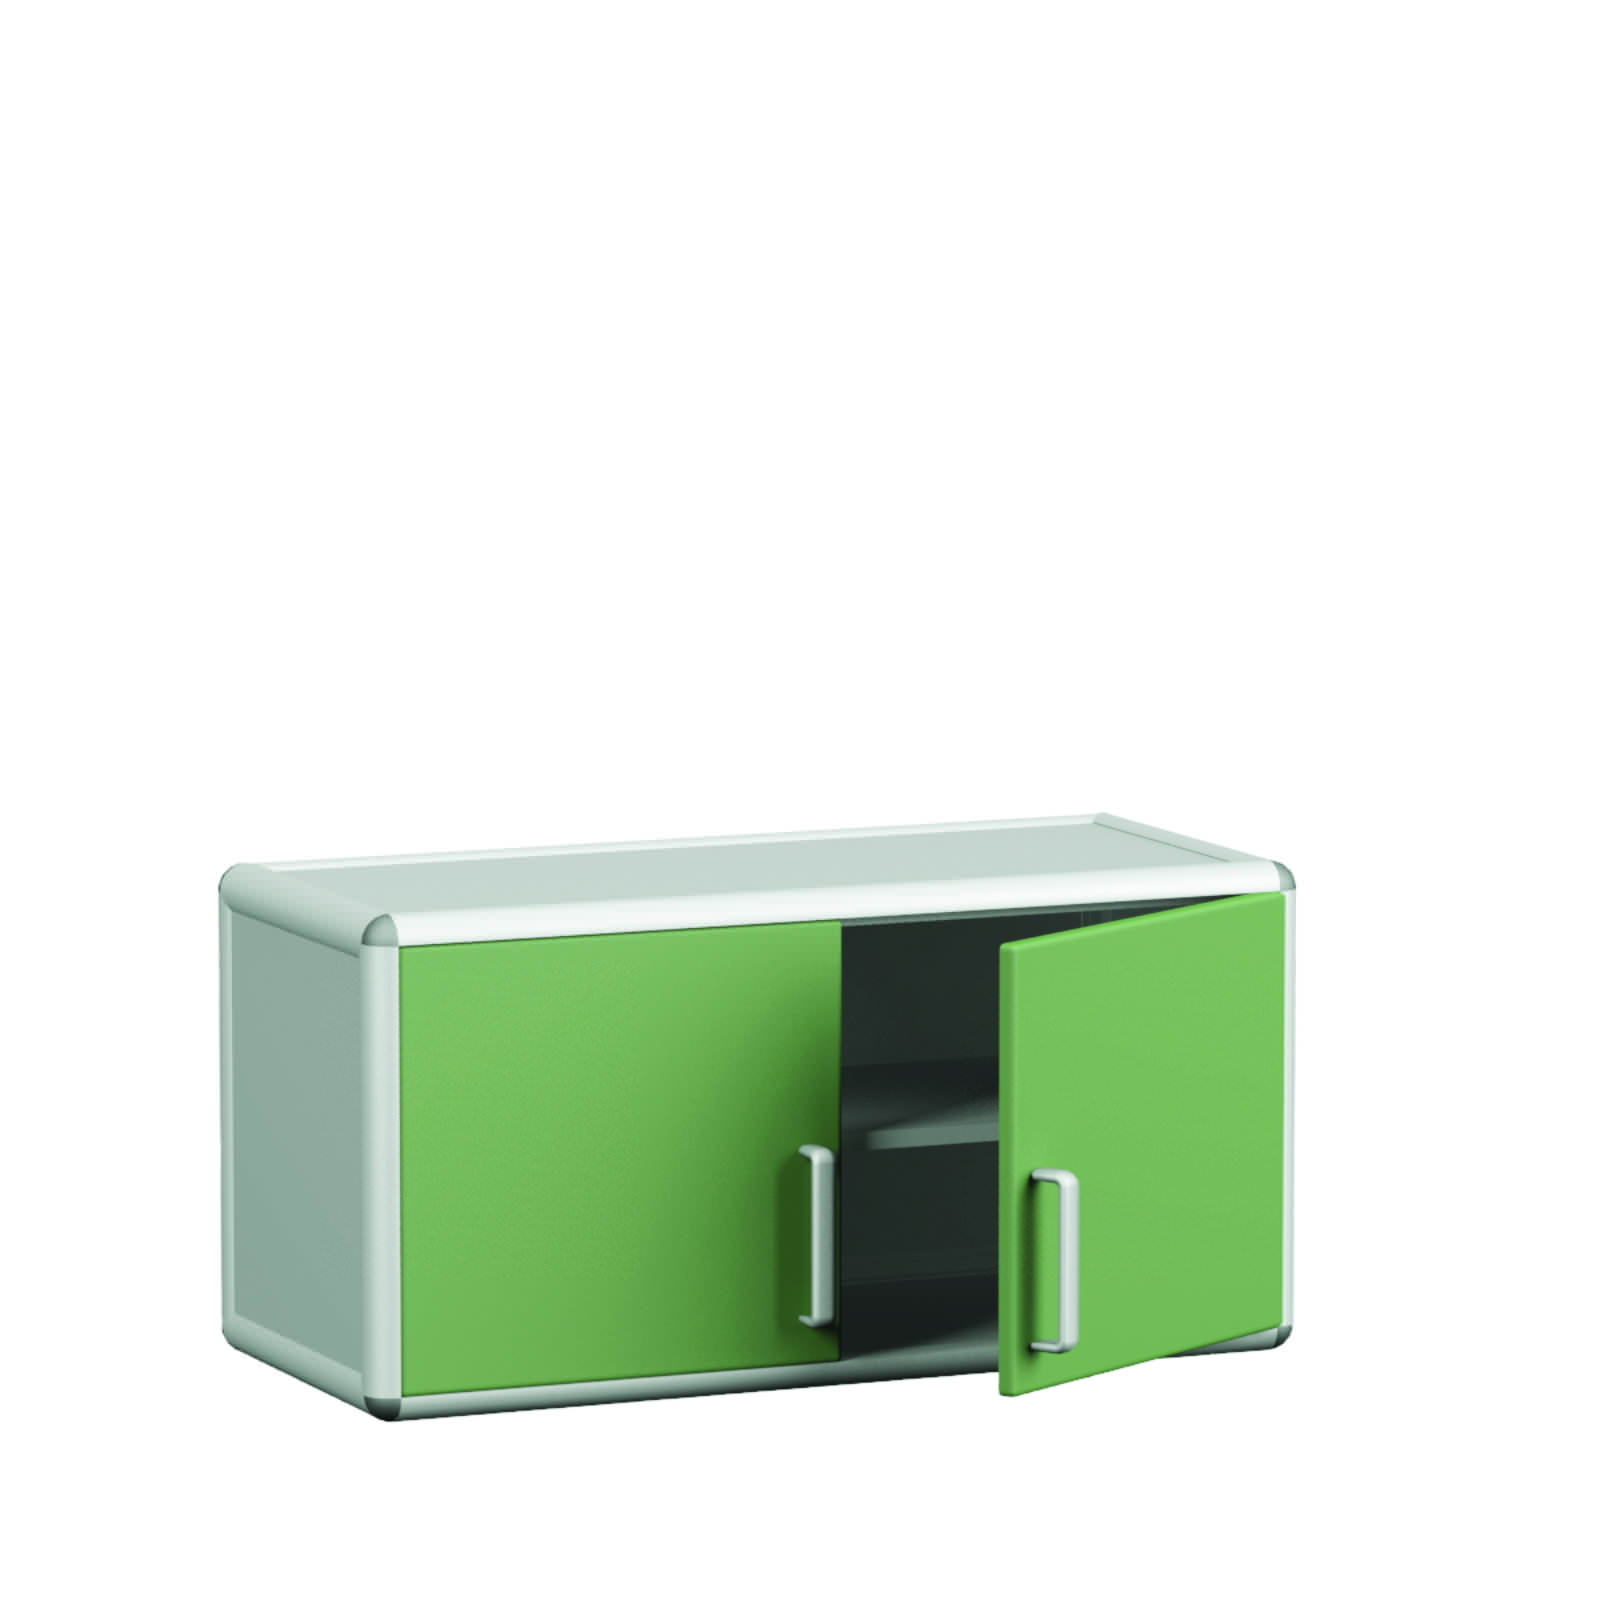 Шкаф навесной ДМ-1-002-04